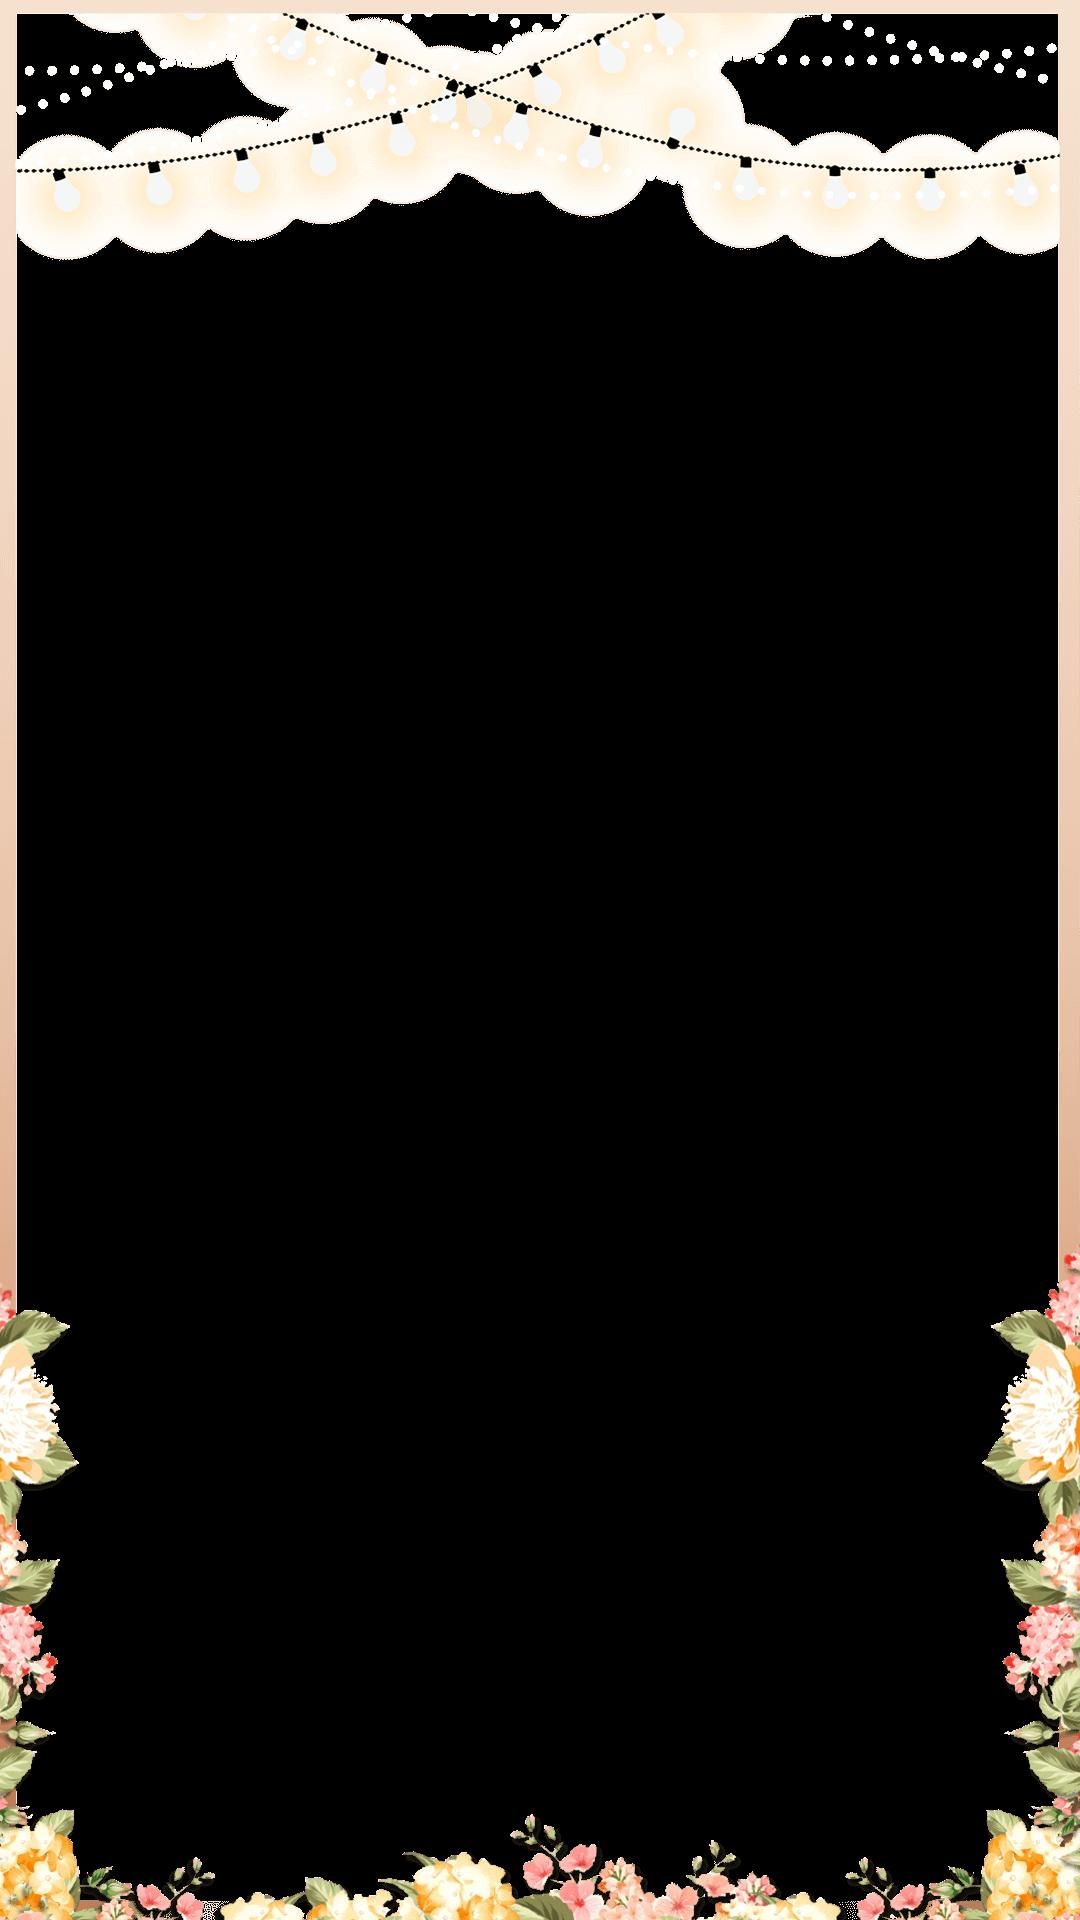 Elegant rose gold spring floral wedding snapchat filter geofilter maker on filterpop for Geofilter template free